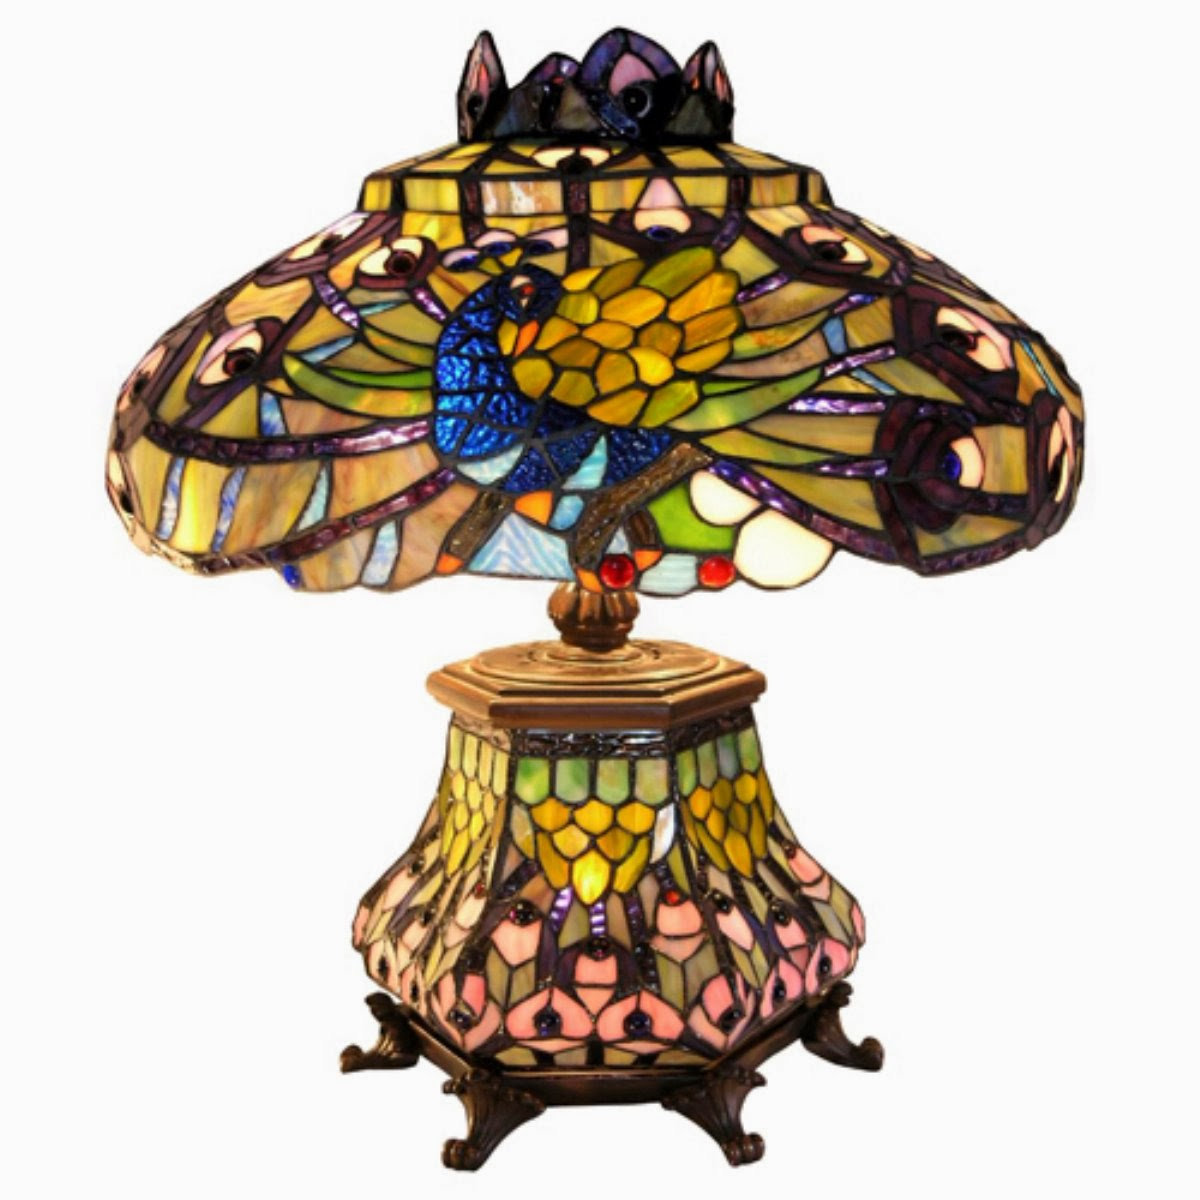 Tiffany Style Peacock Lantern Table Lamp ~ Luxury Light